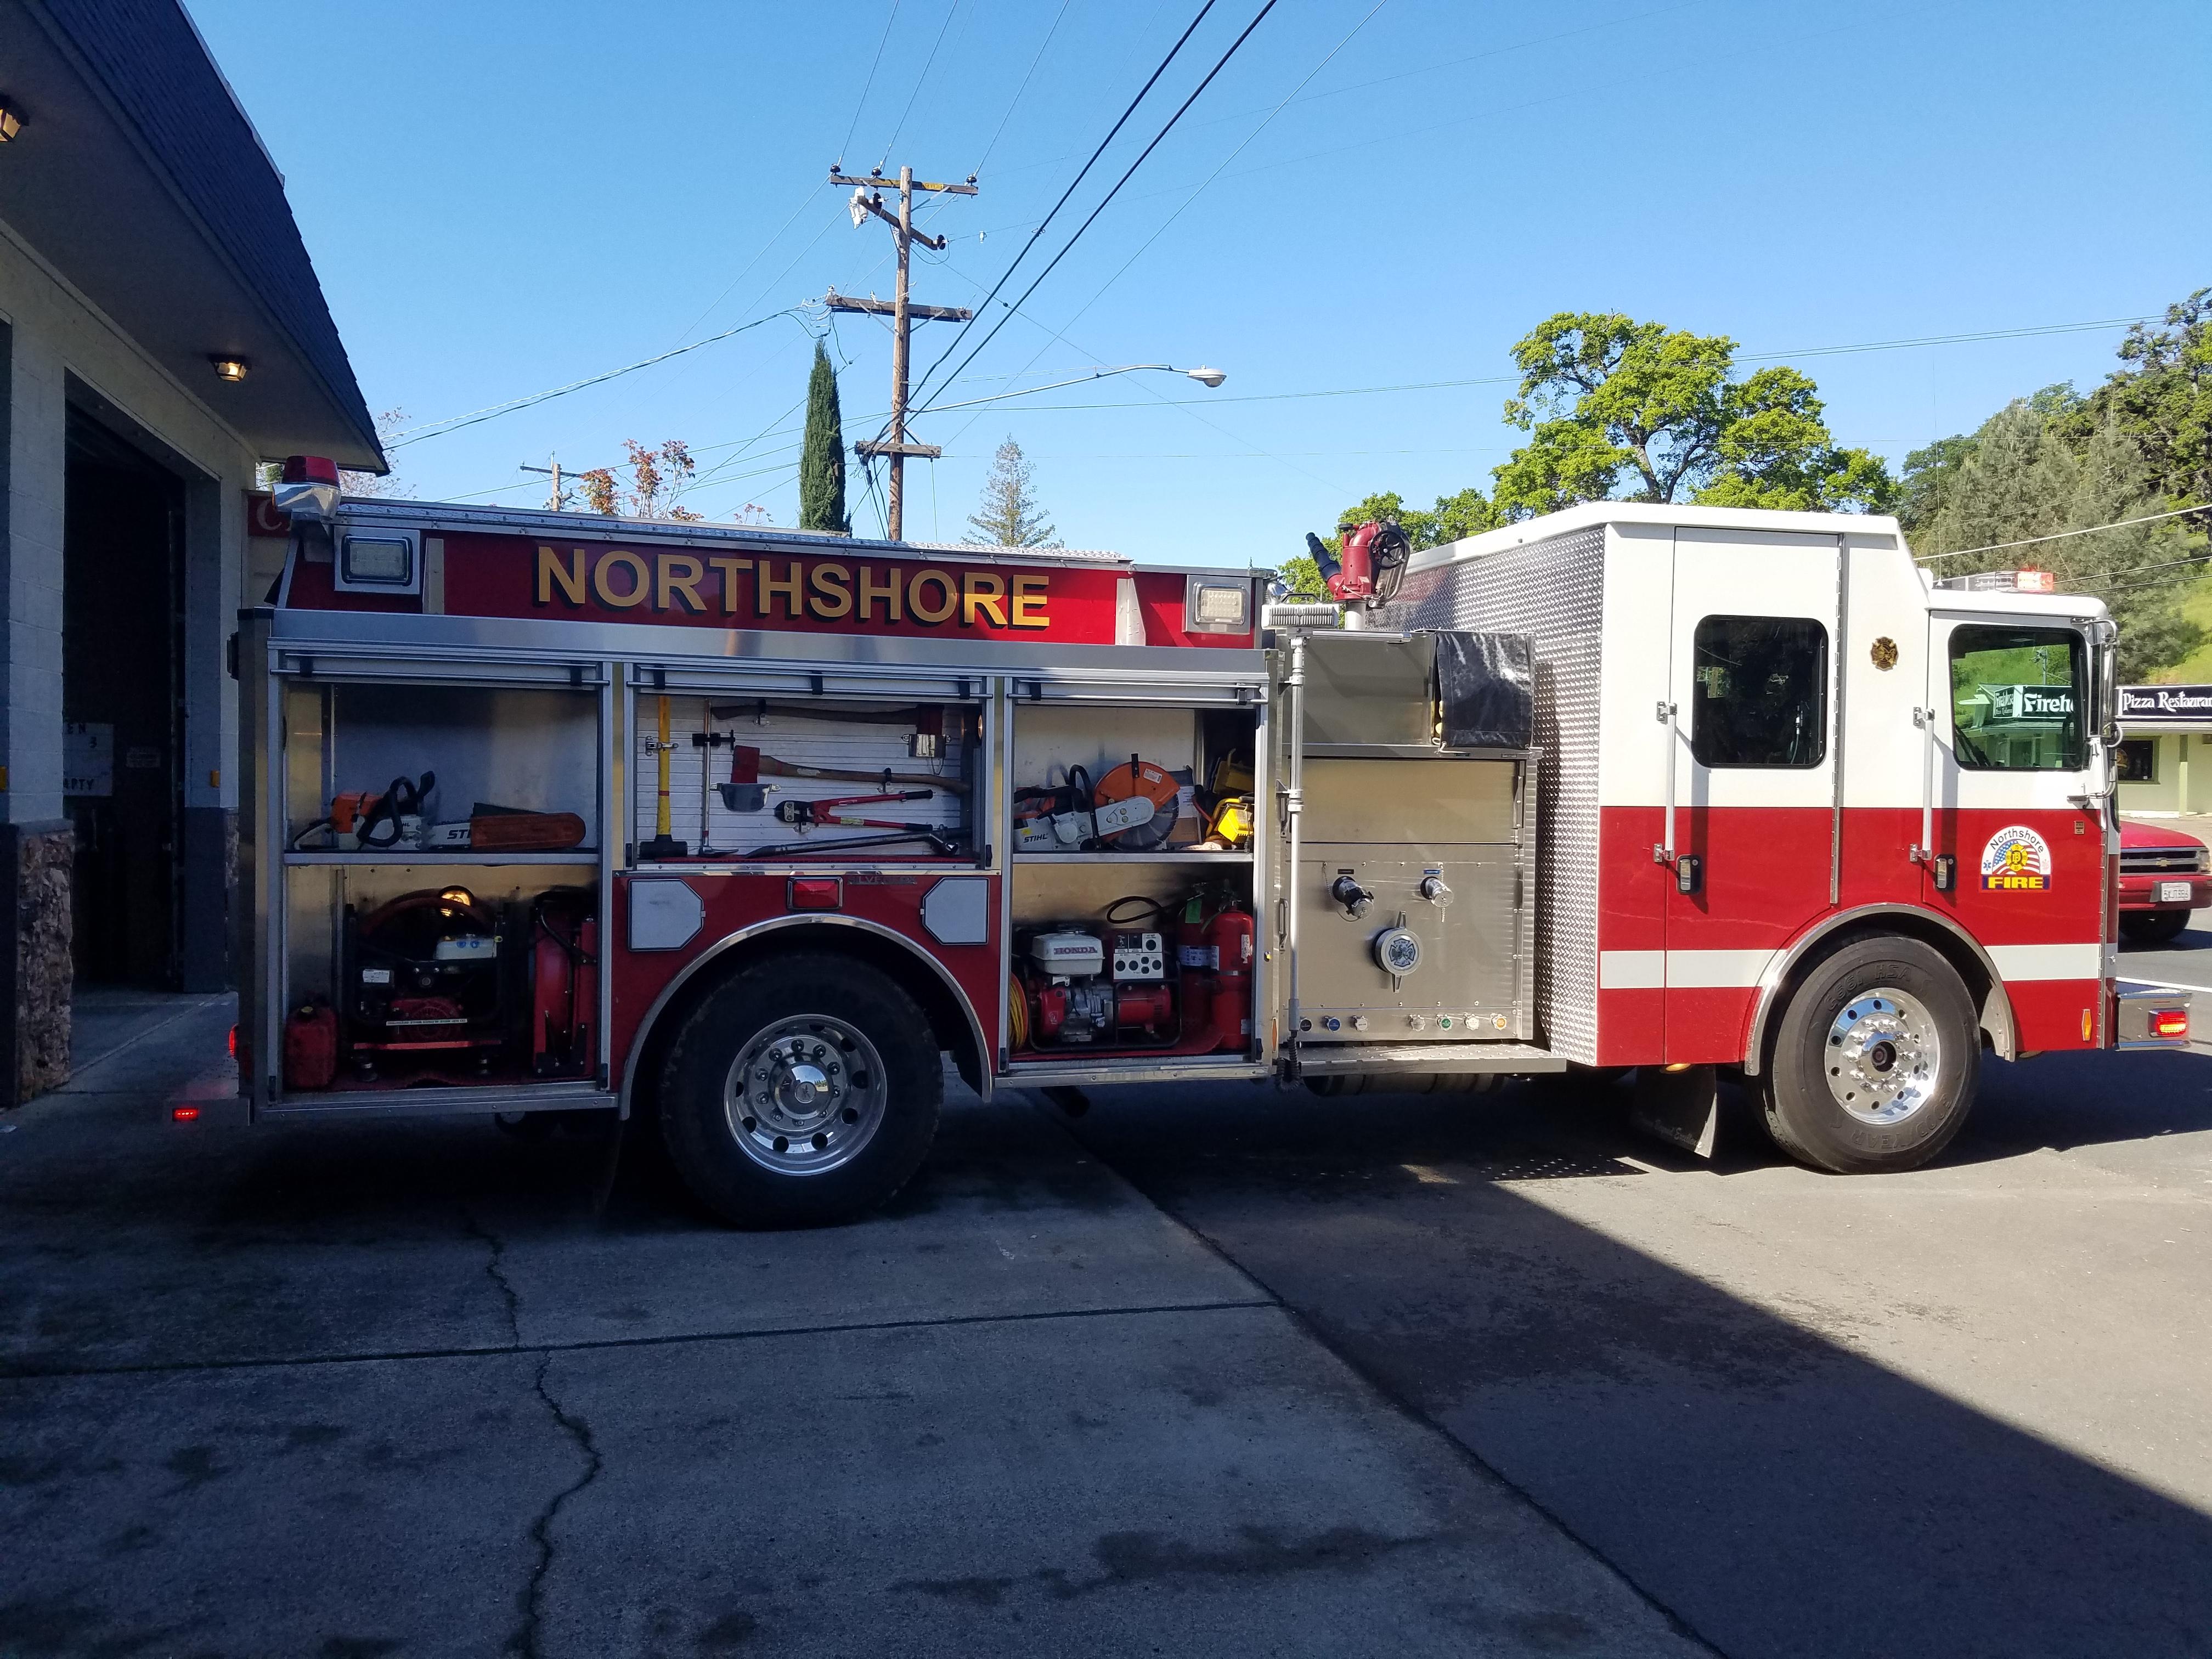 Northshore Fire